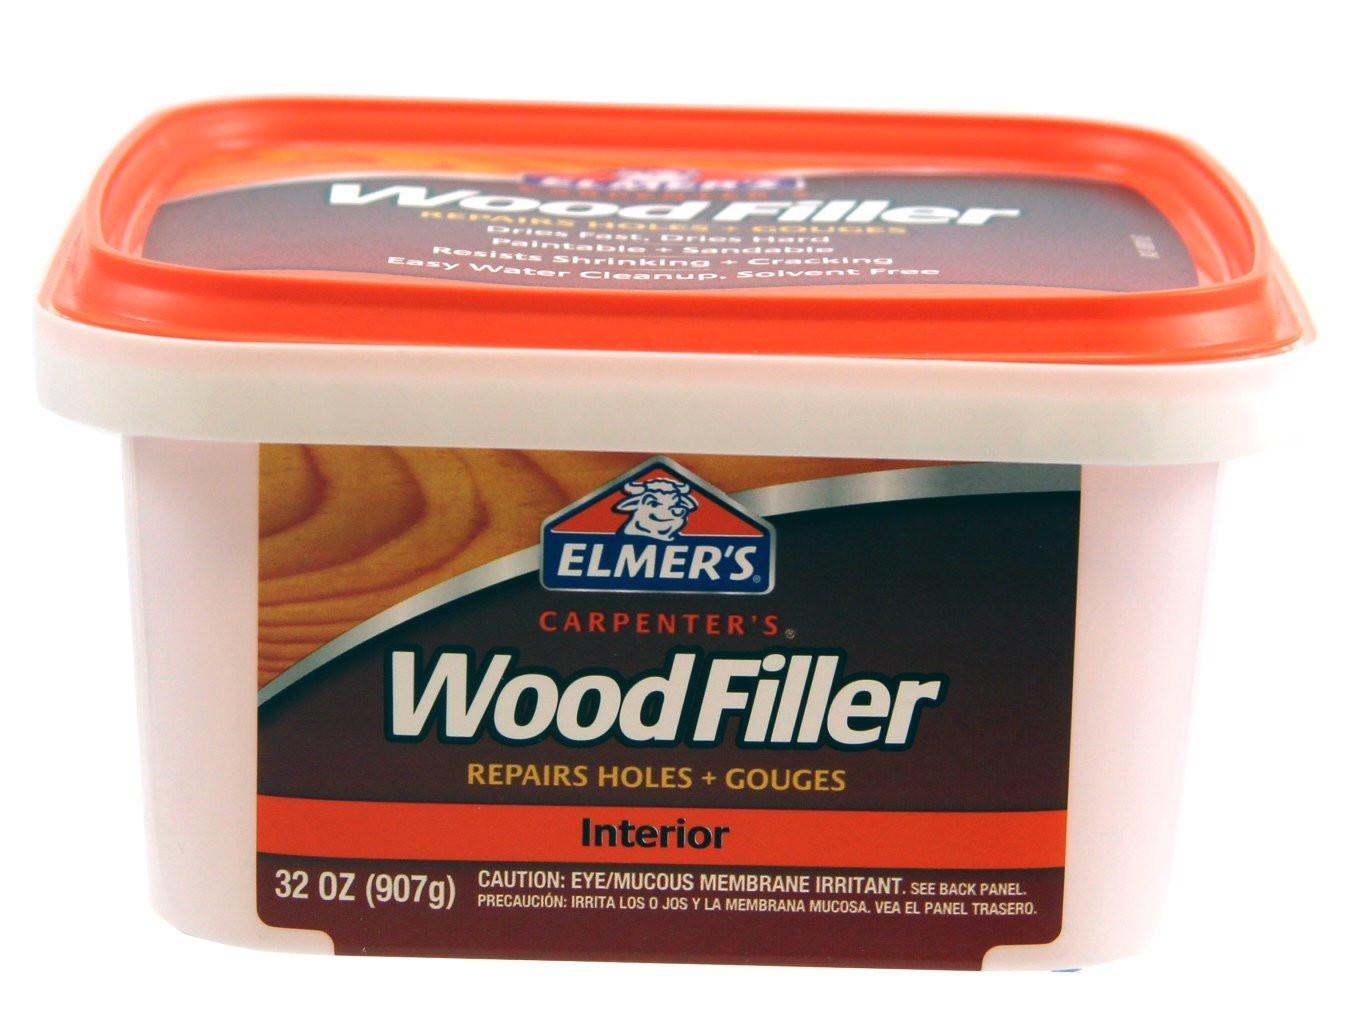 Wood Filler for Hardwood Floor Gaps Of Amazon Com Elmers E848d12 Carpenters Wood Filler 1 2 Pint within Amazon Com Elmers E848d12 Carpenters Wood Filler 1 2 Pint Elmers Products Home Improvement